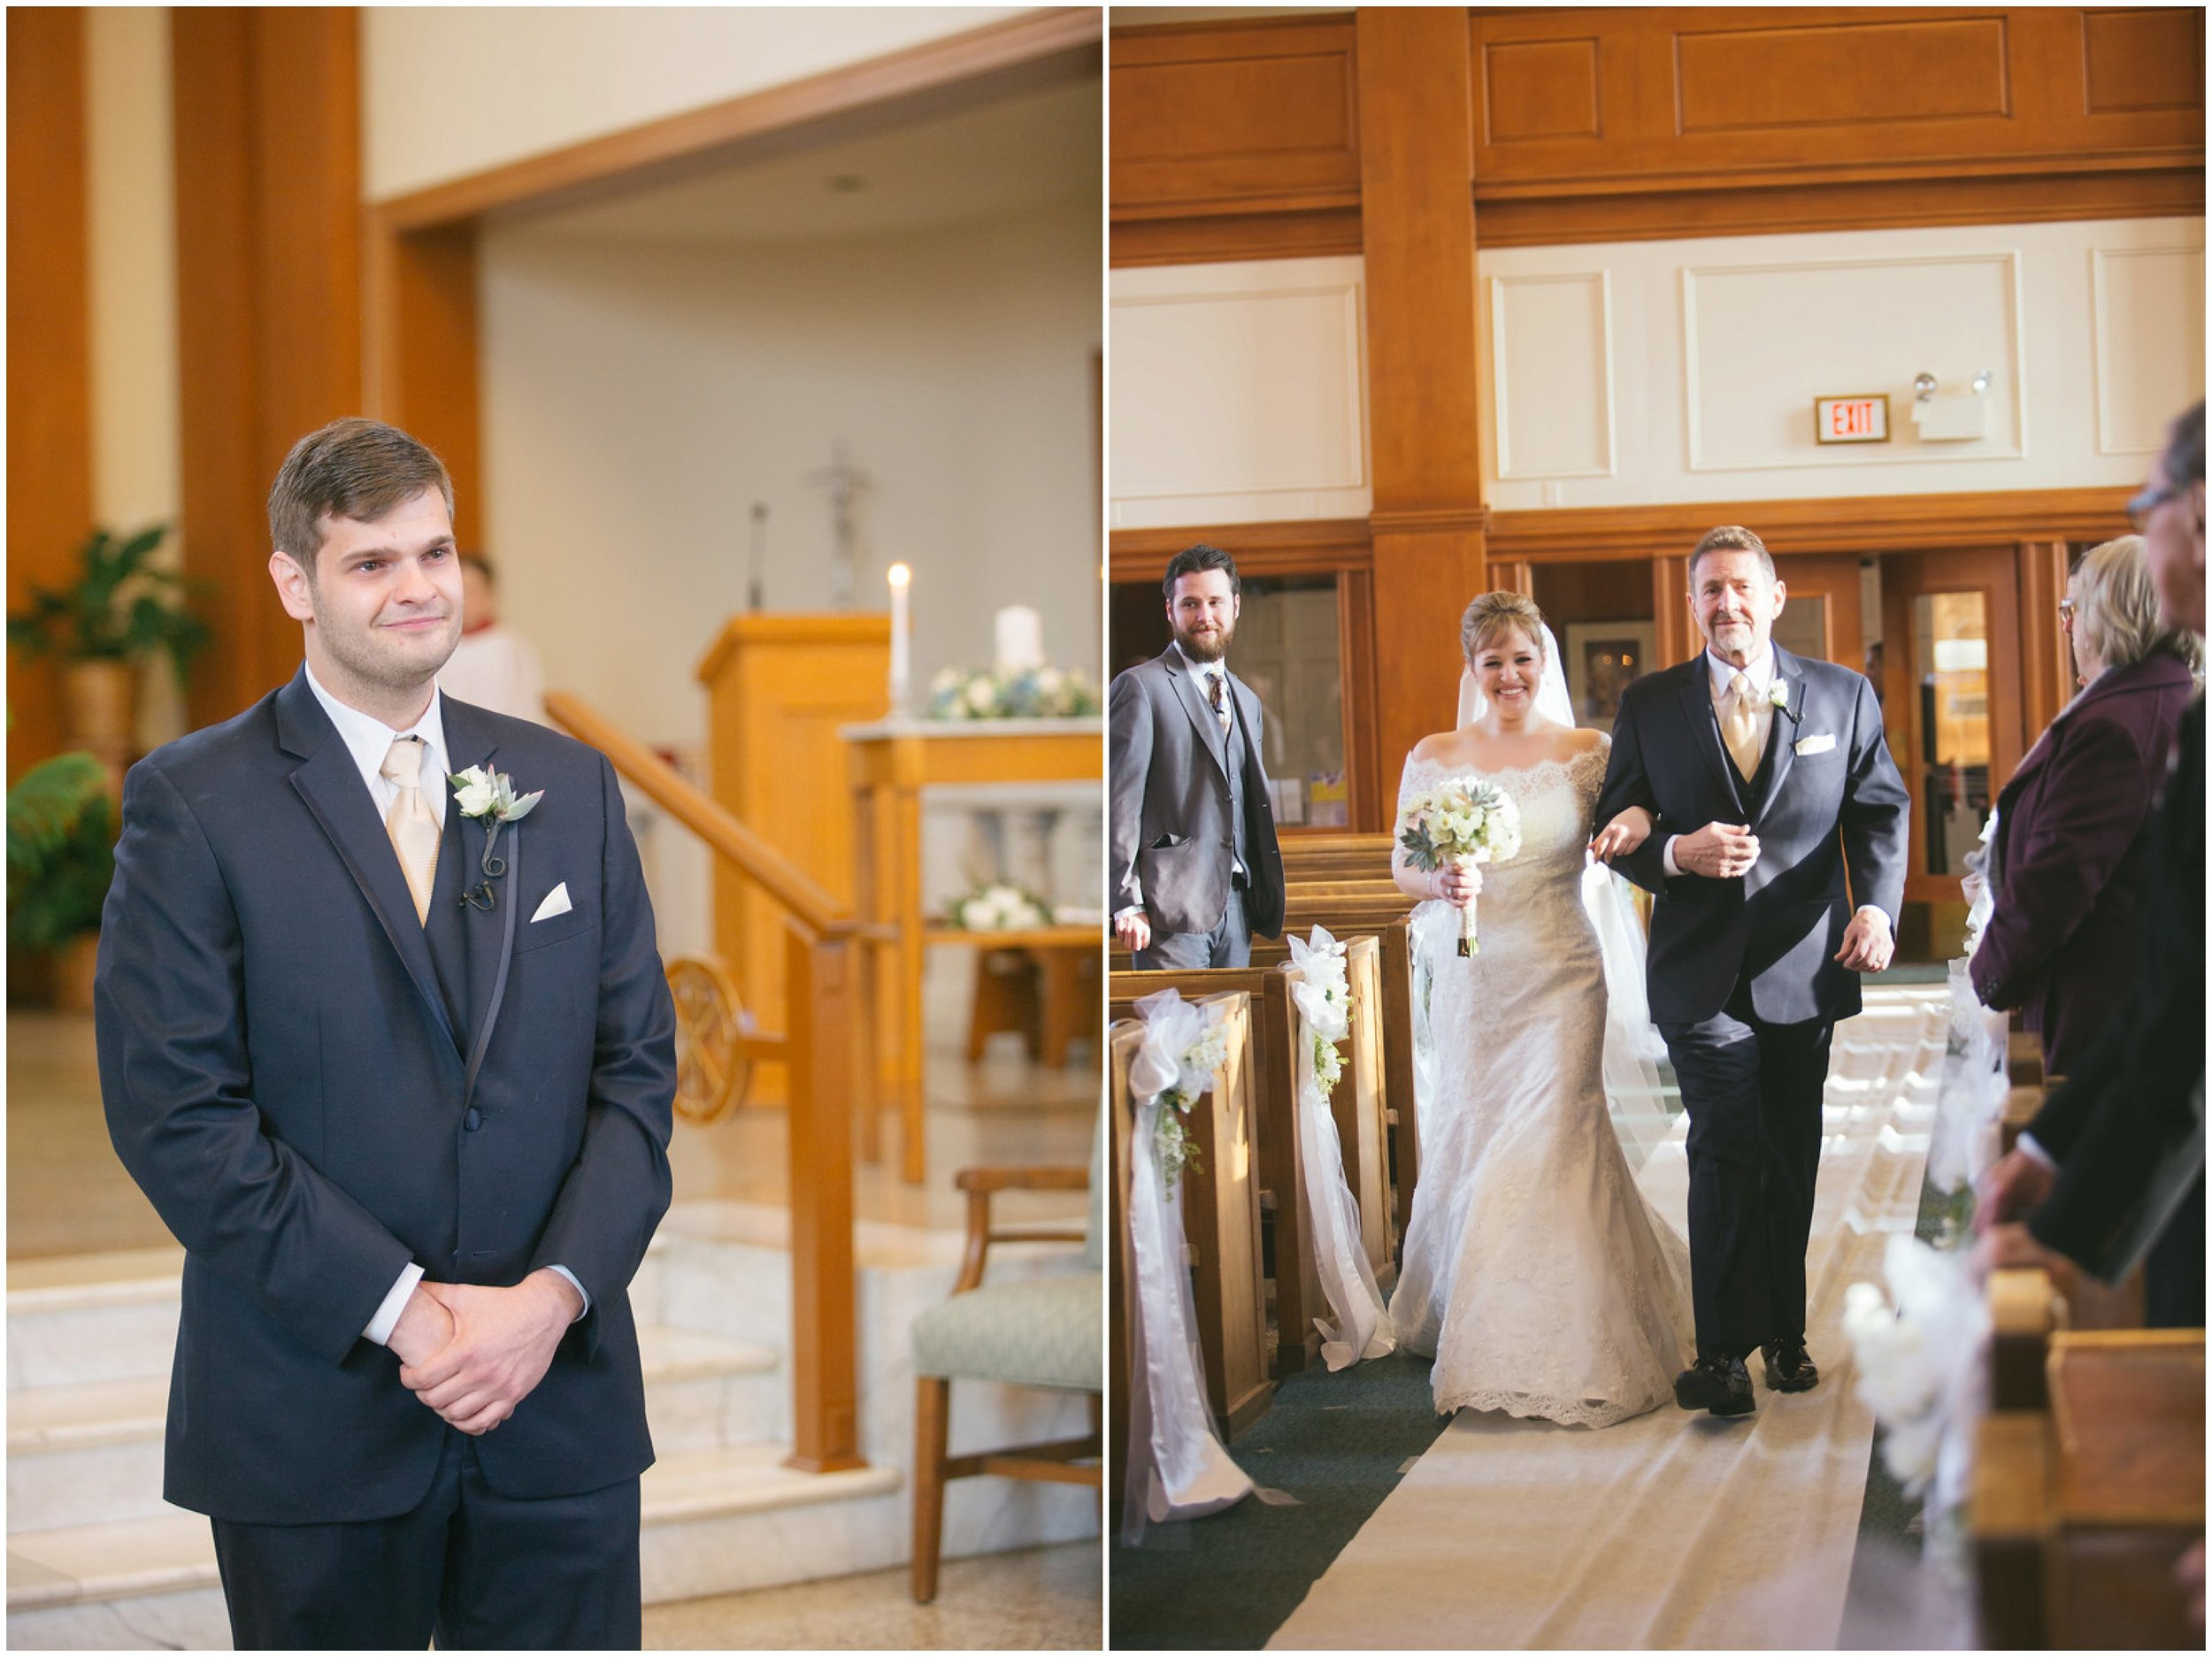 Le Cape Weddings- Chicago Wedding Photography - Sam_and_Josh-127-X3_LuxuryDestinationPhotographer.jpg